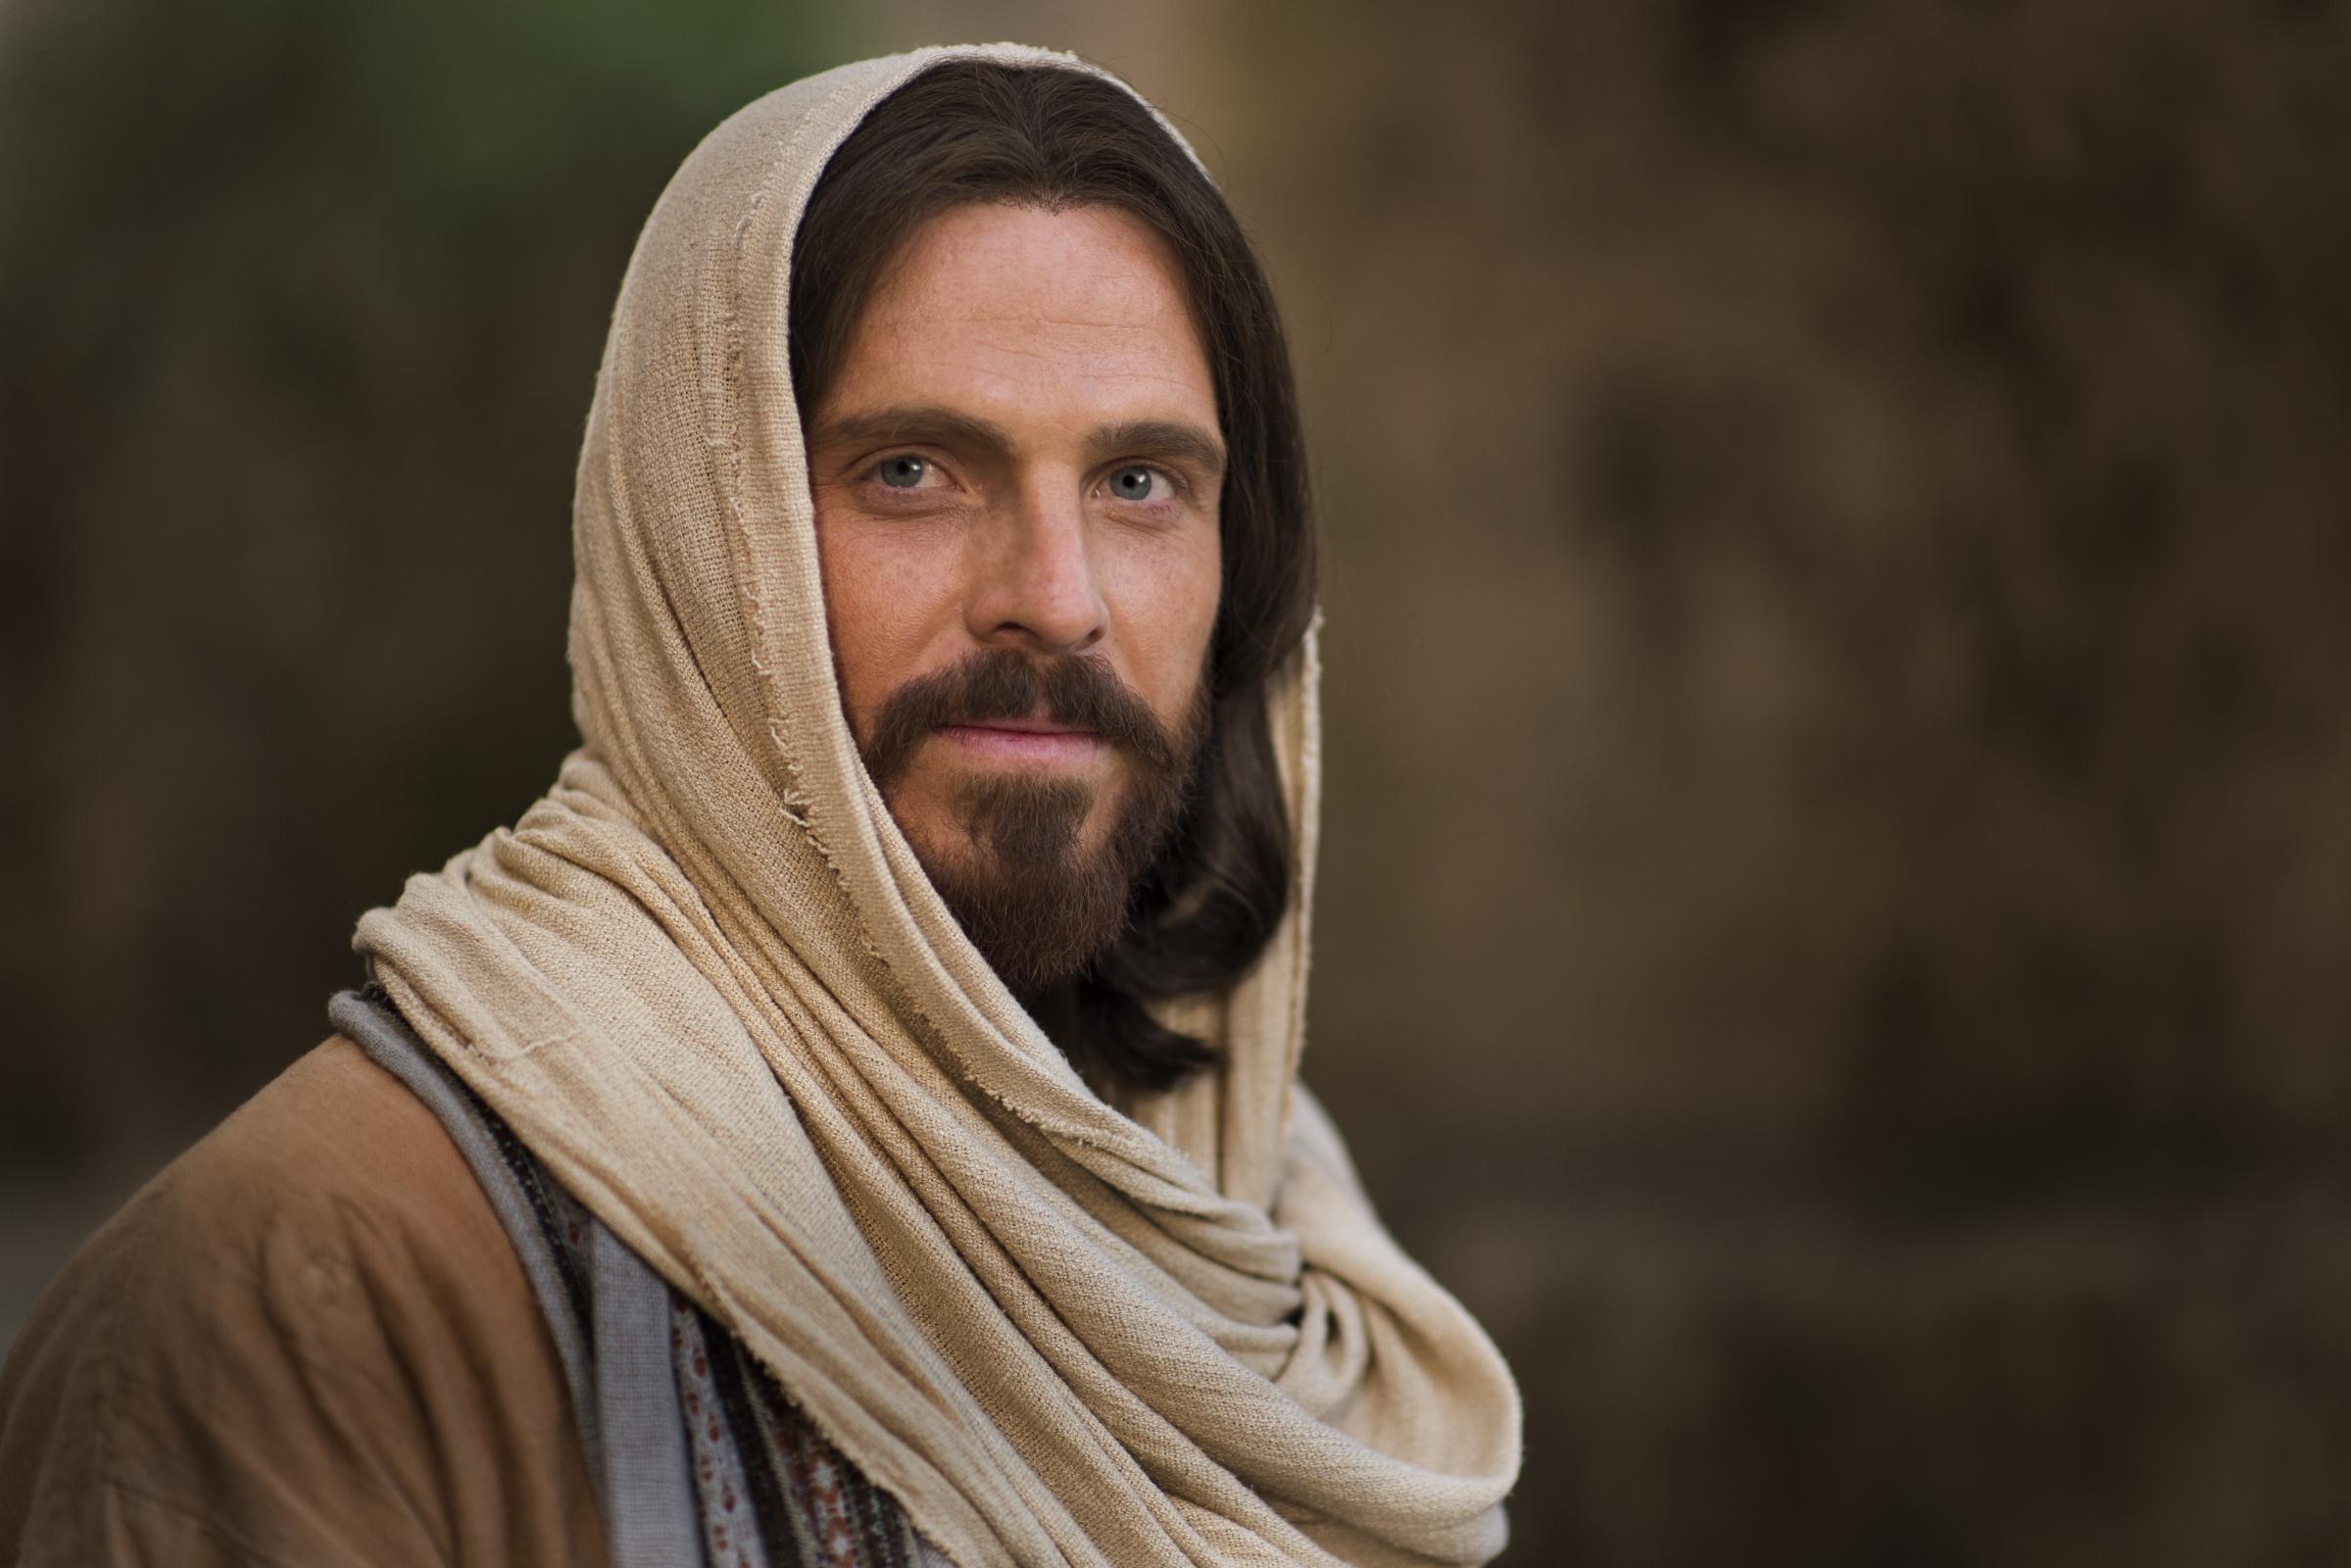 Lds Jesus Christ Wallpaper Jesus christ 1138494 wallpaper 2399x1600